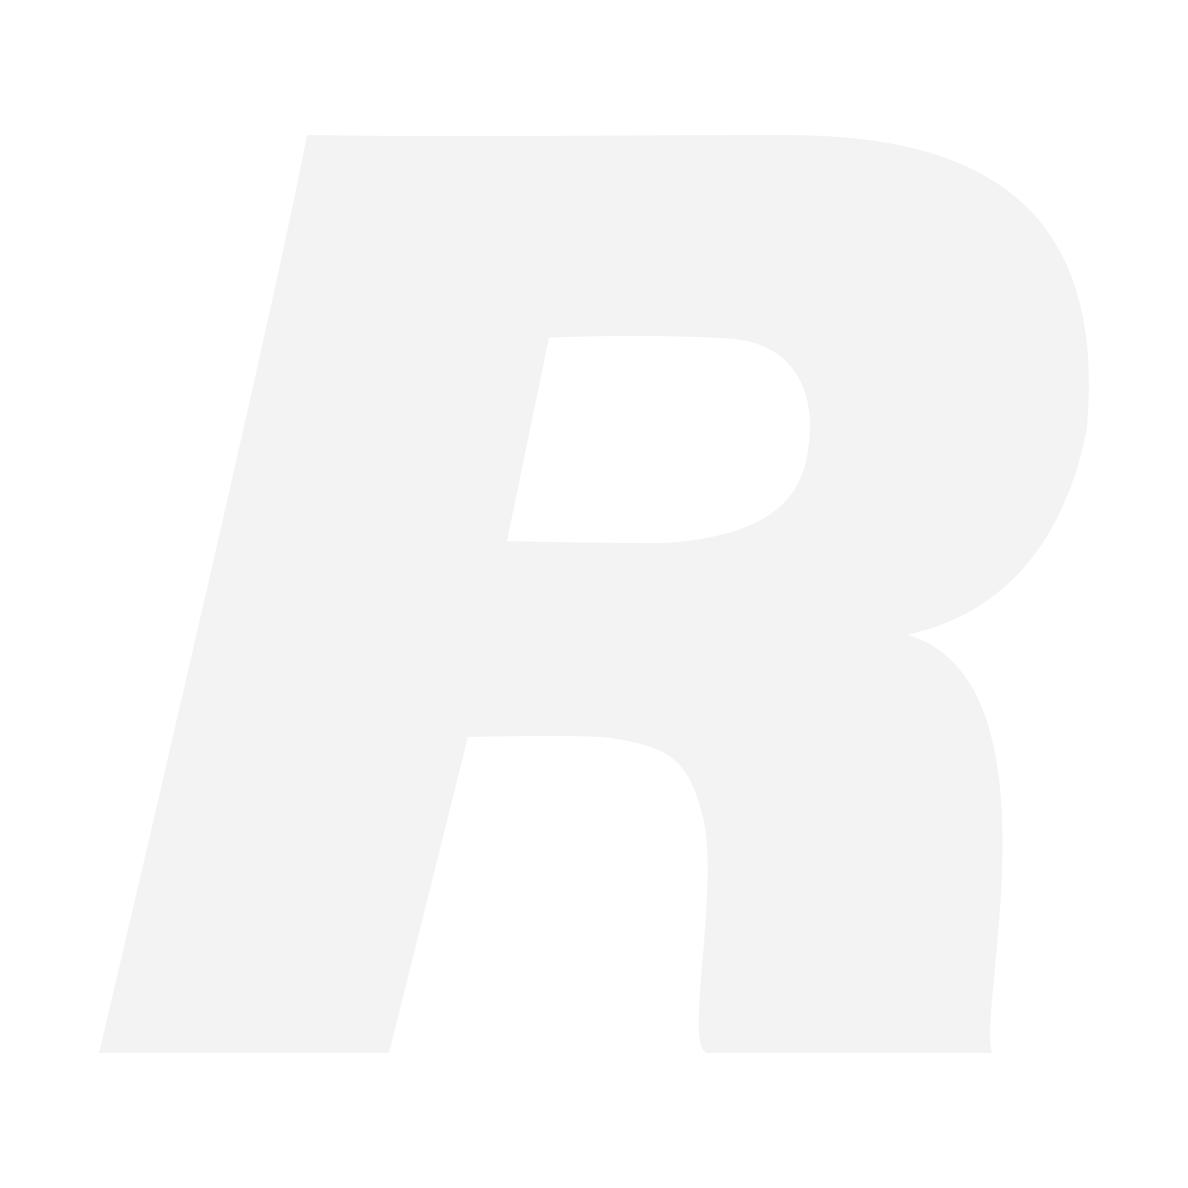 Sony A7R Mark IV + Tamron 28-75/2.8 Di III RXD systemkamera